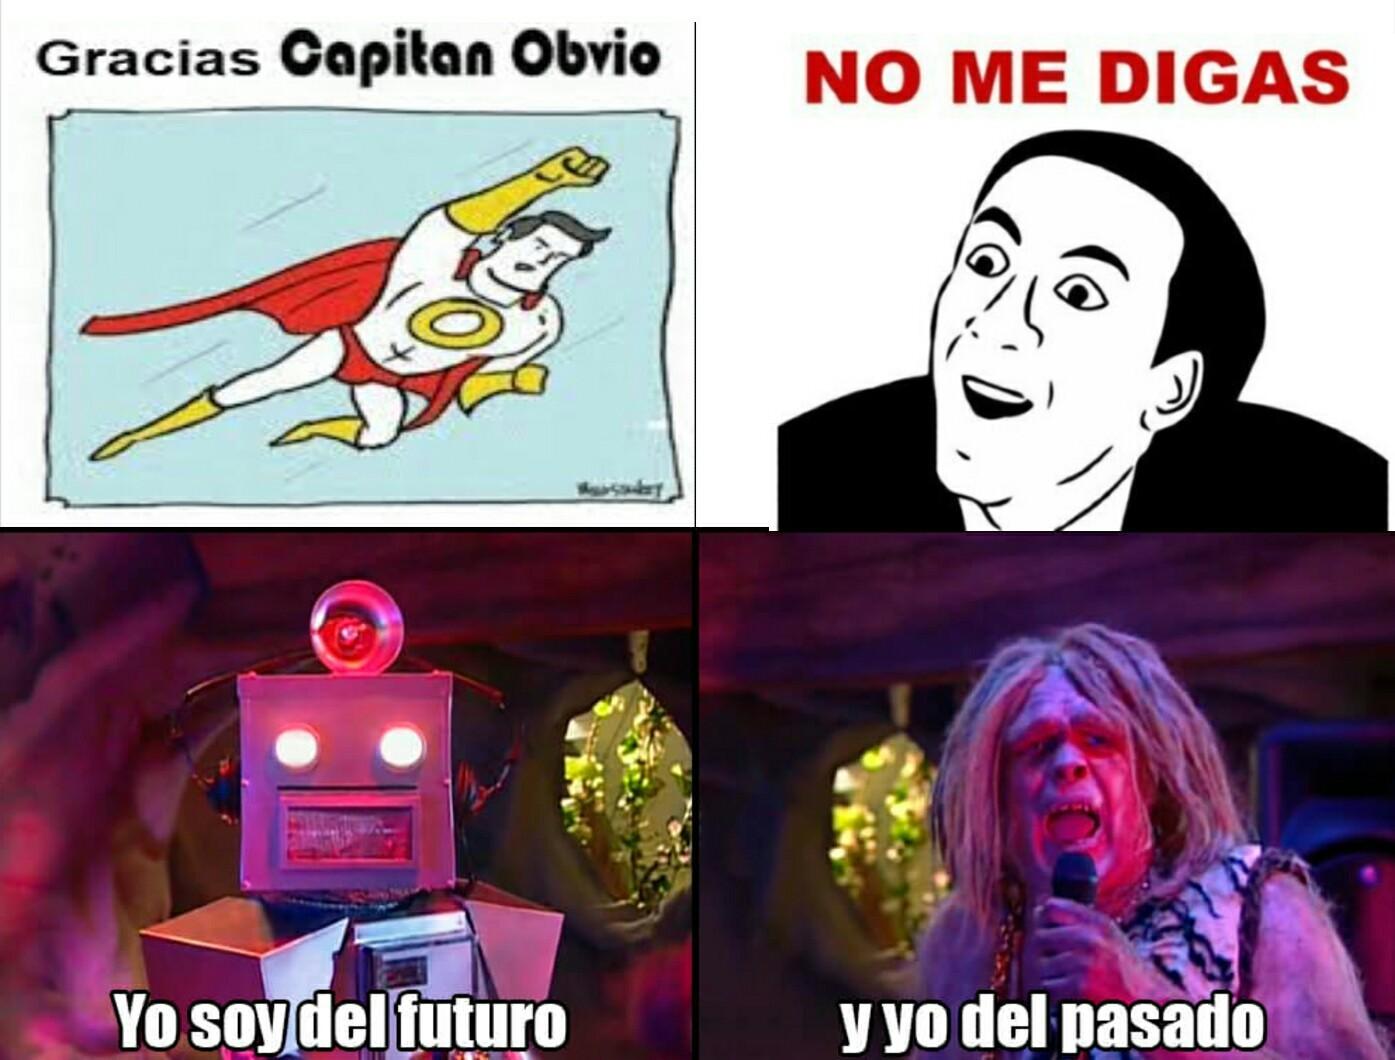 Capitán Obvio vs No me digas - meme